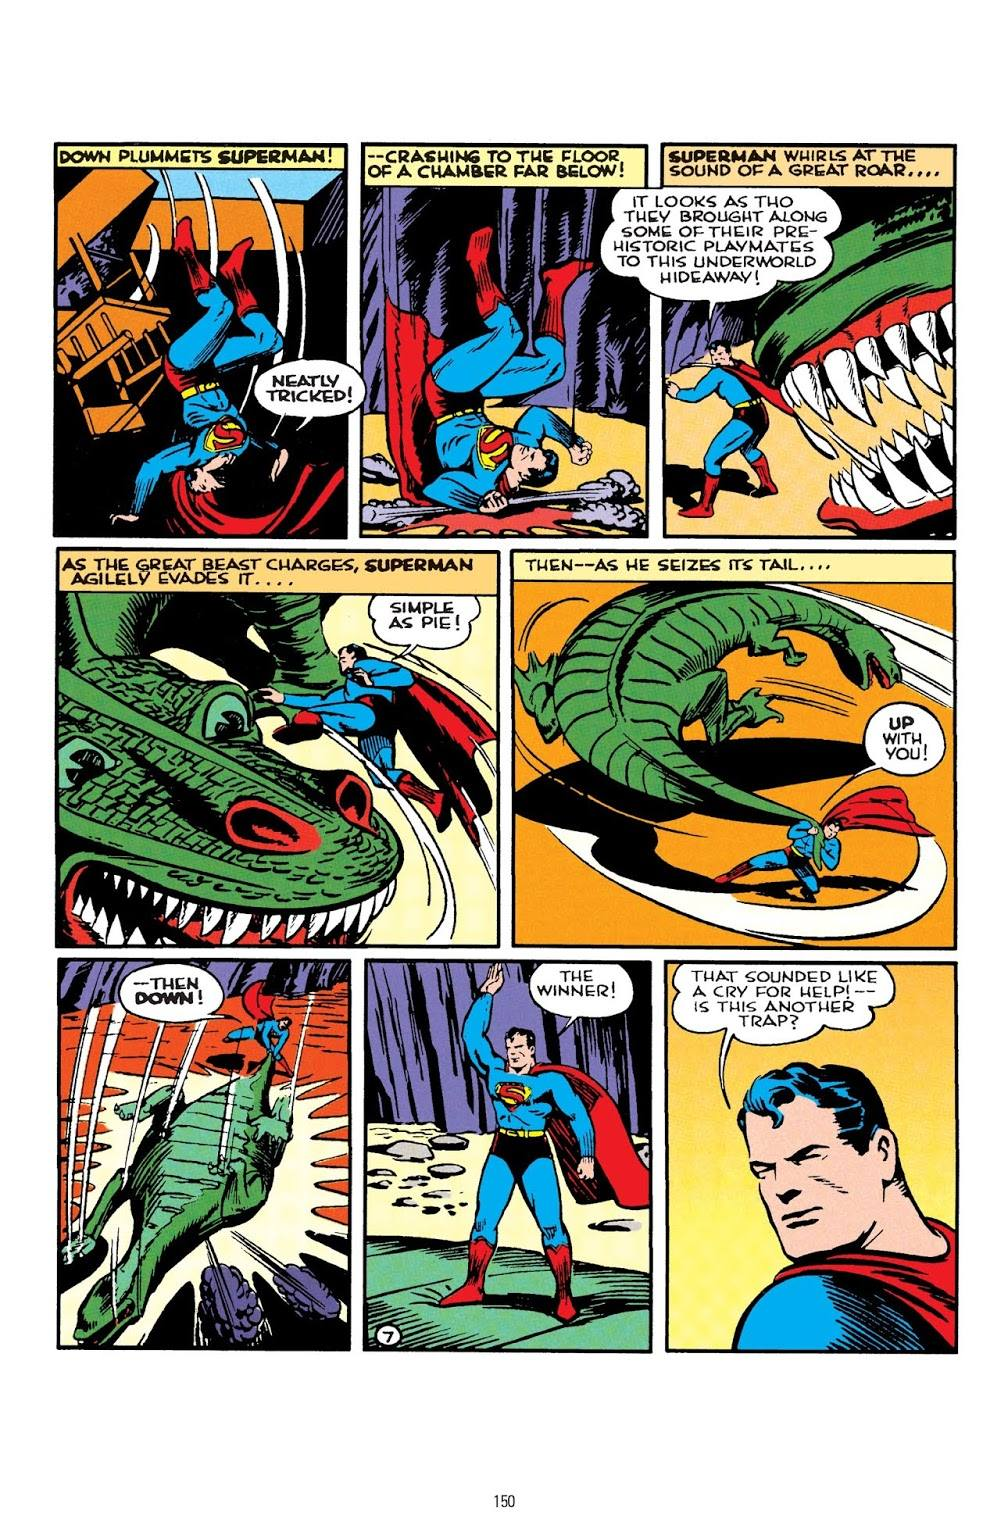 Superman The Golden Age Omnibus Vol. 2 review